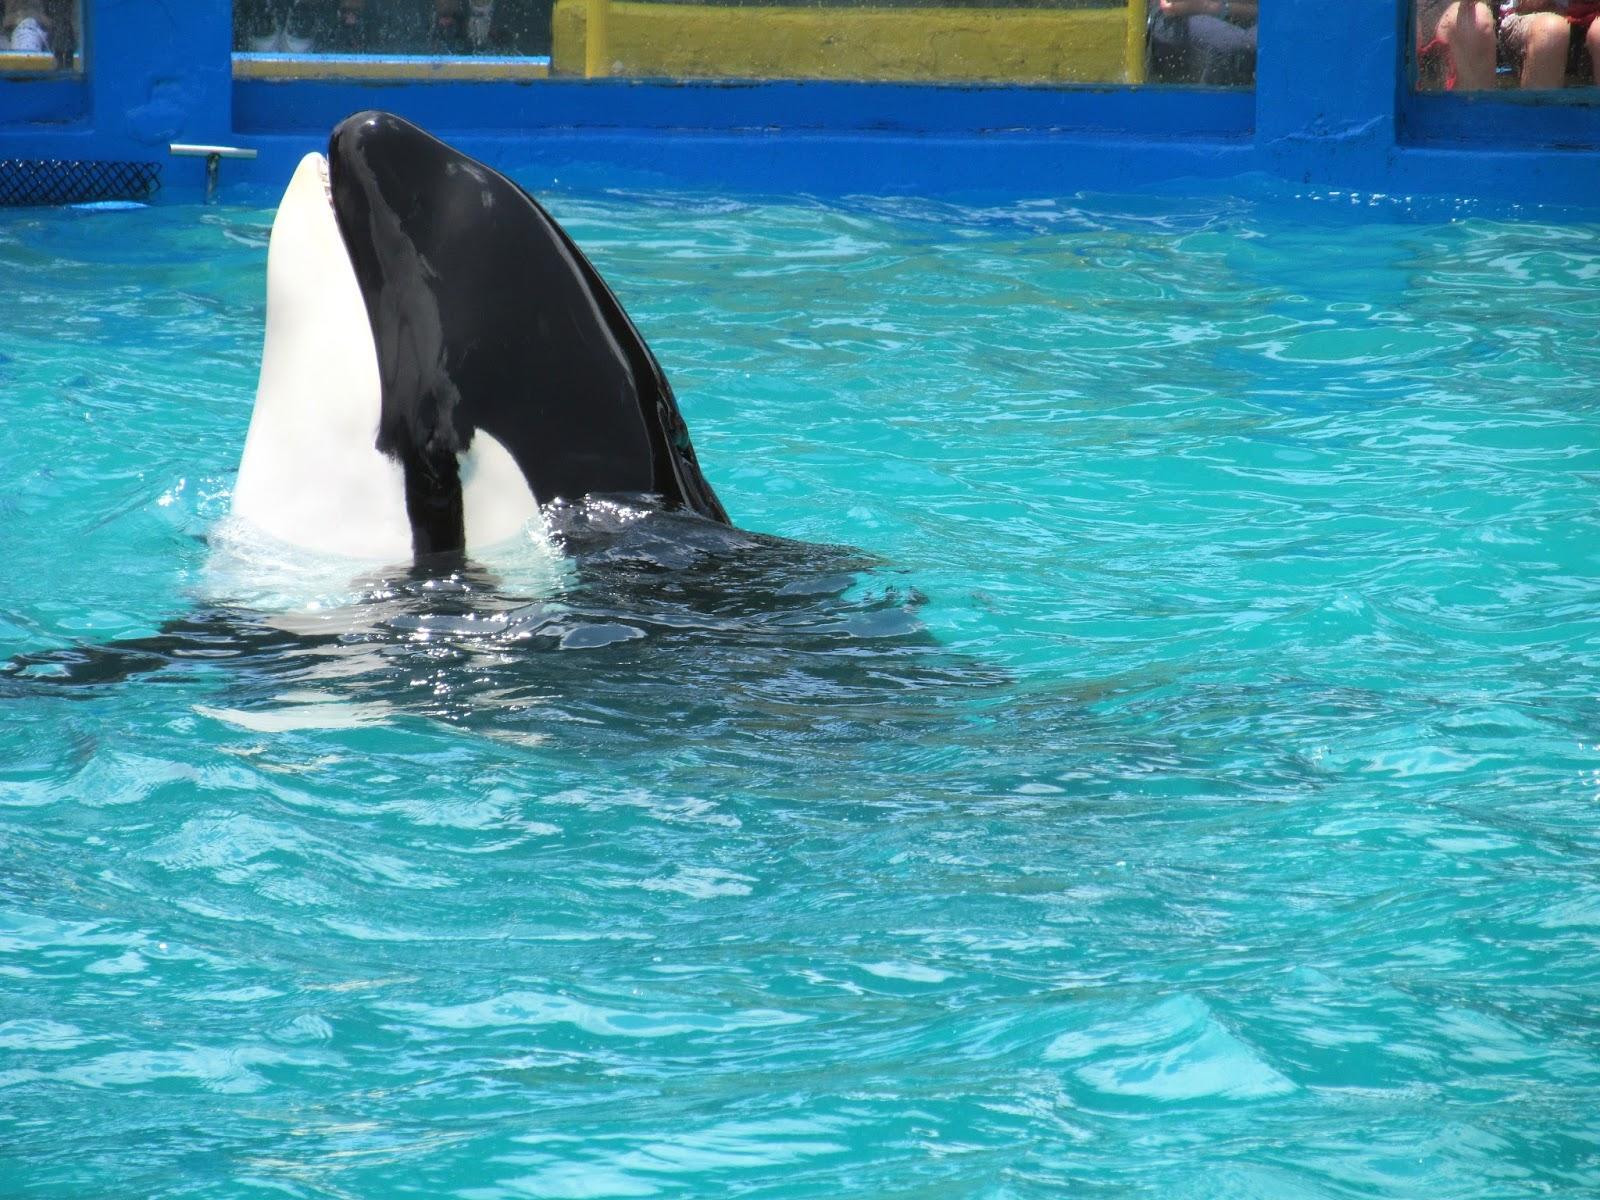 Killer Whale Show Miami Seaquarium, FL - ouroutdoortravels.blogspot.com